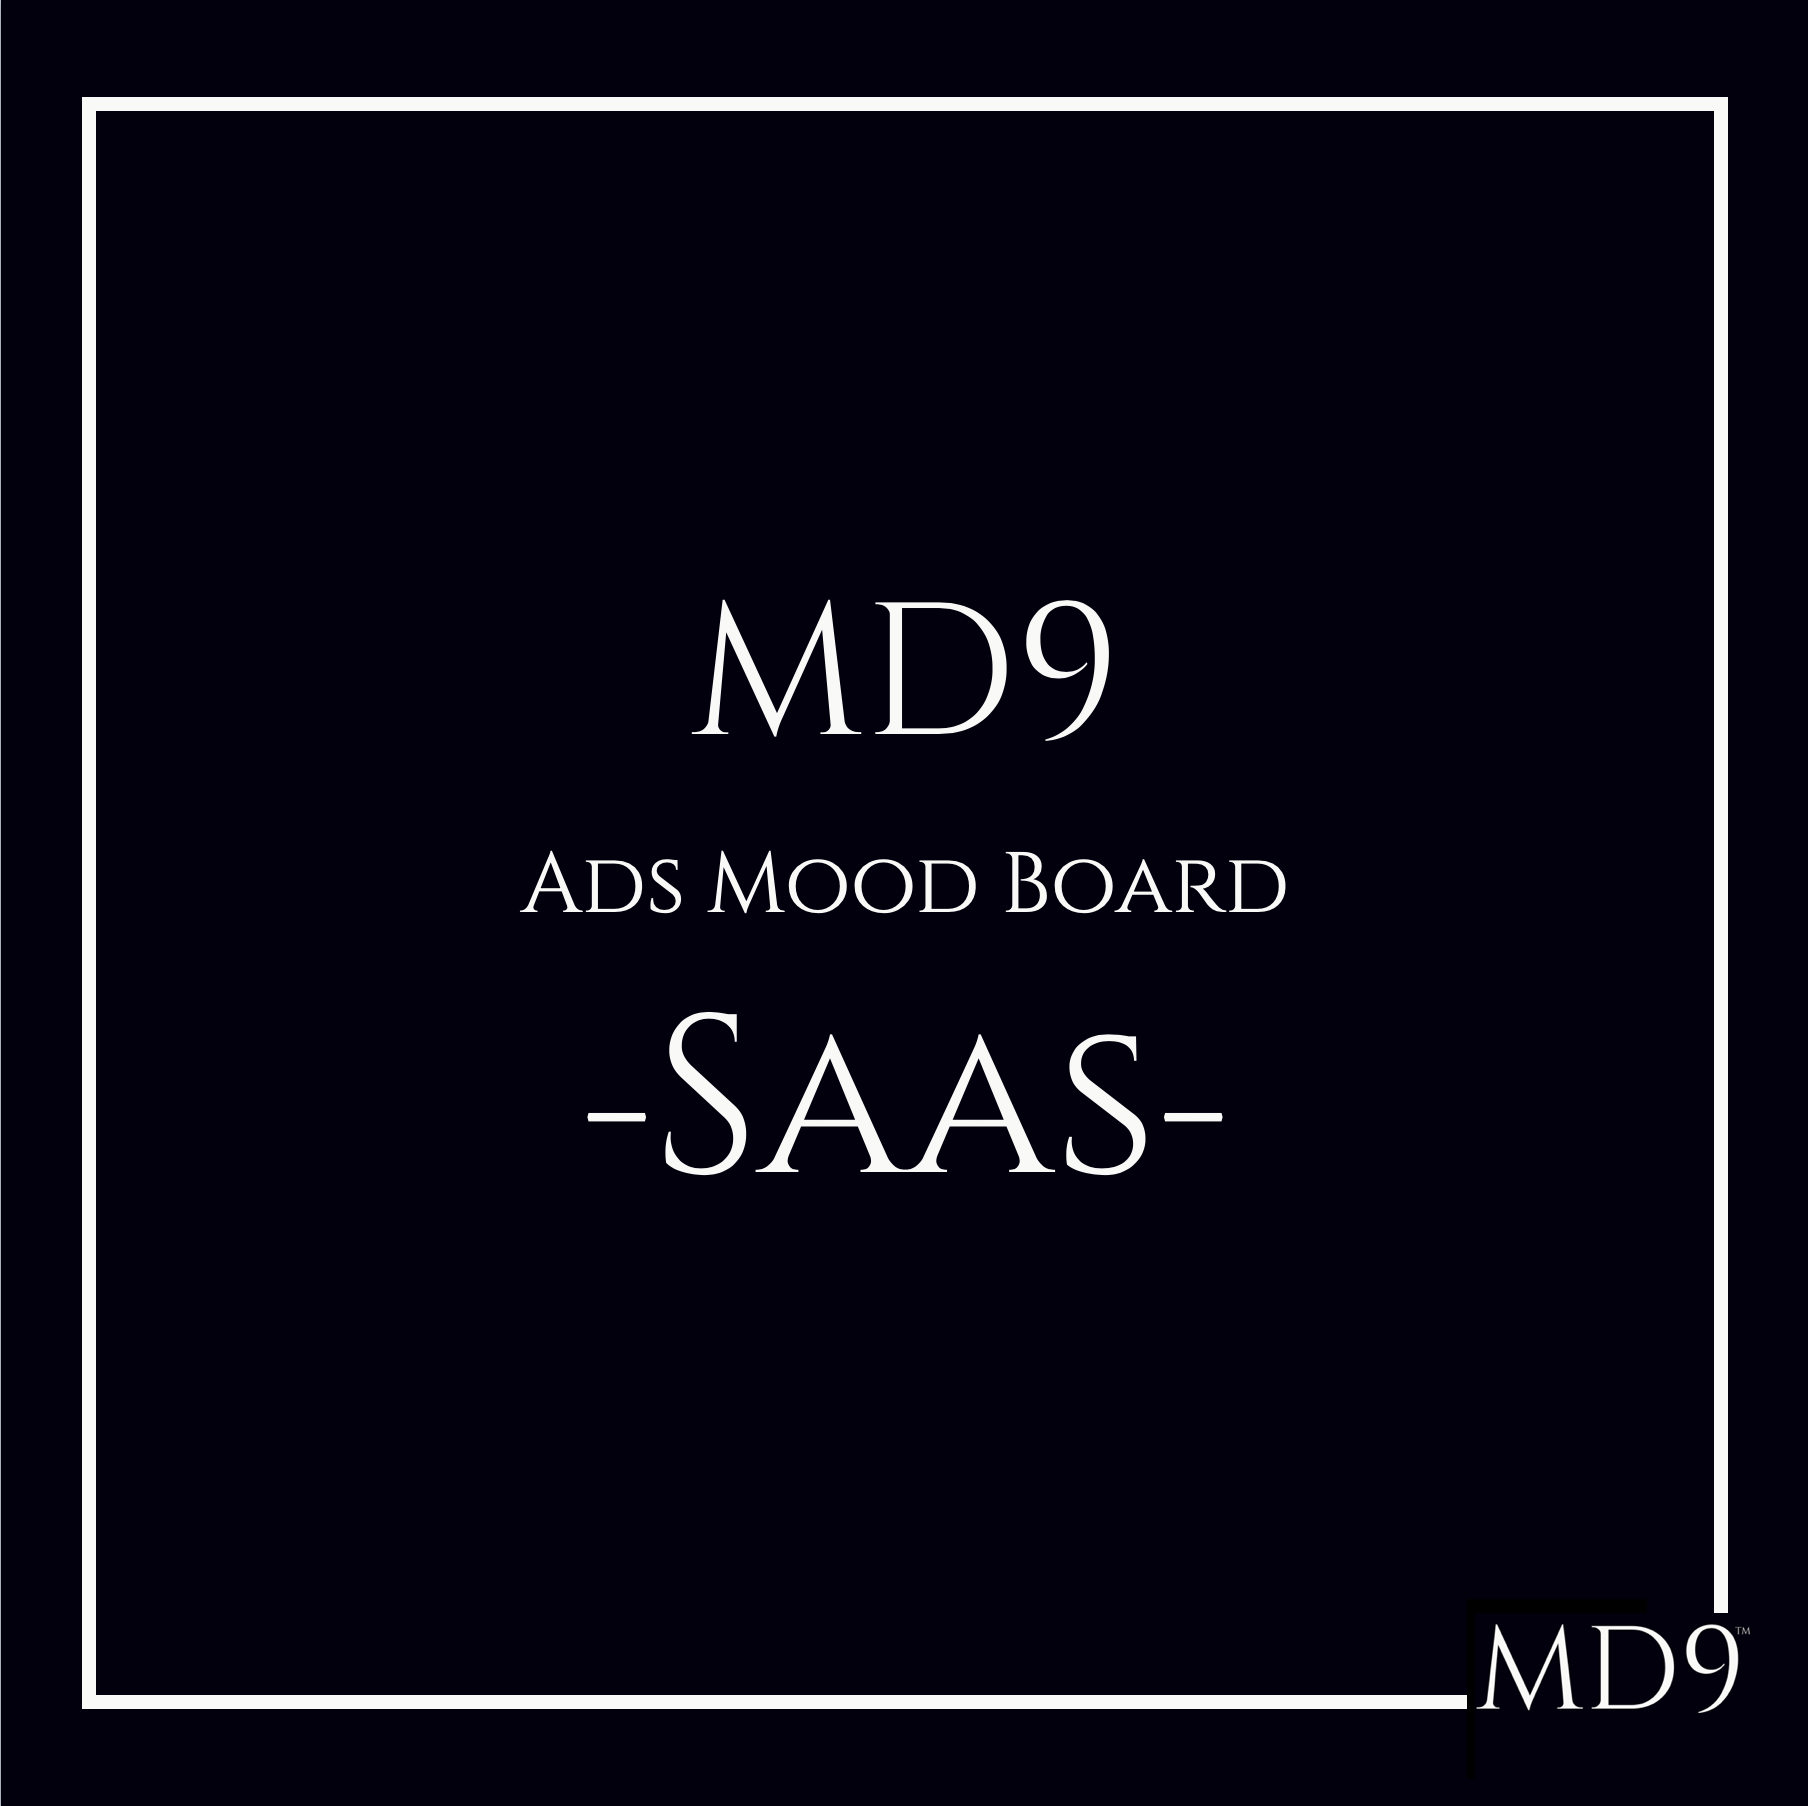 MD9's Ads Mood Board – Saas